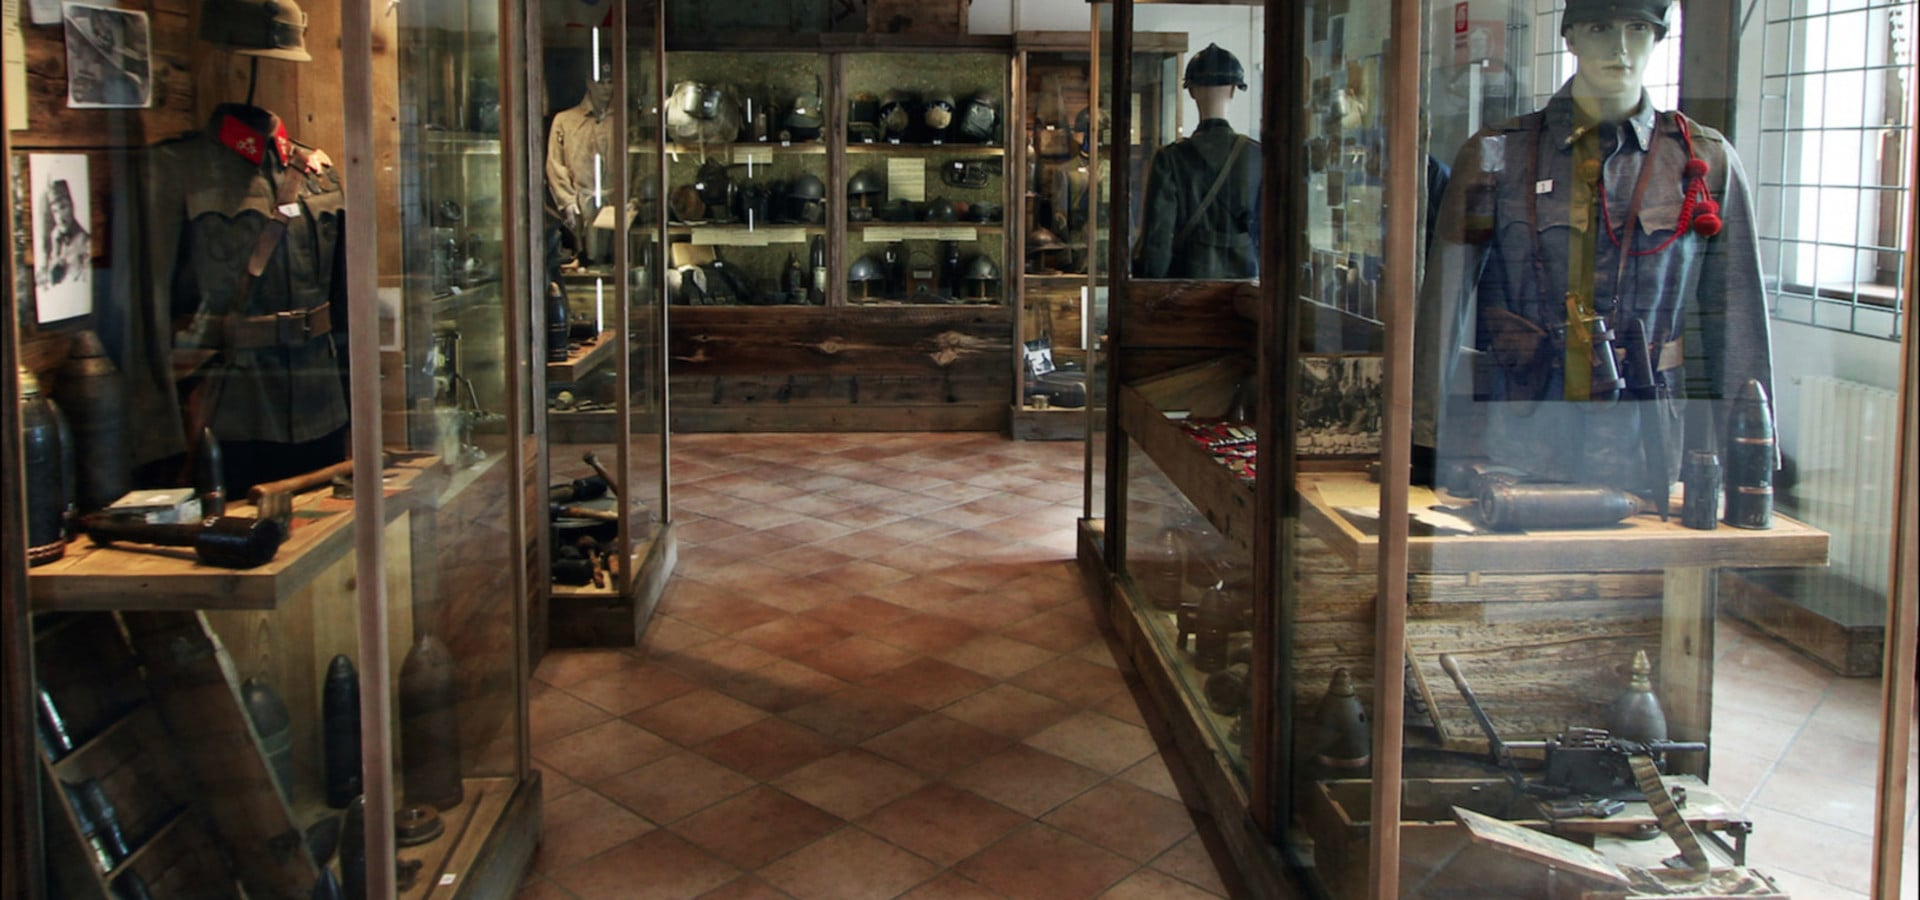 MUSEUM OF THE FIRST WORLD WAR